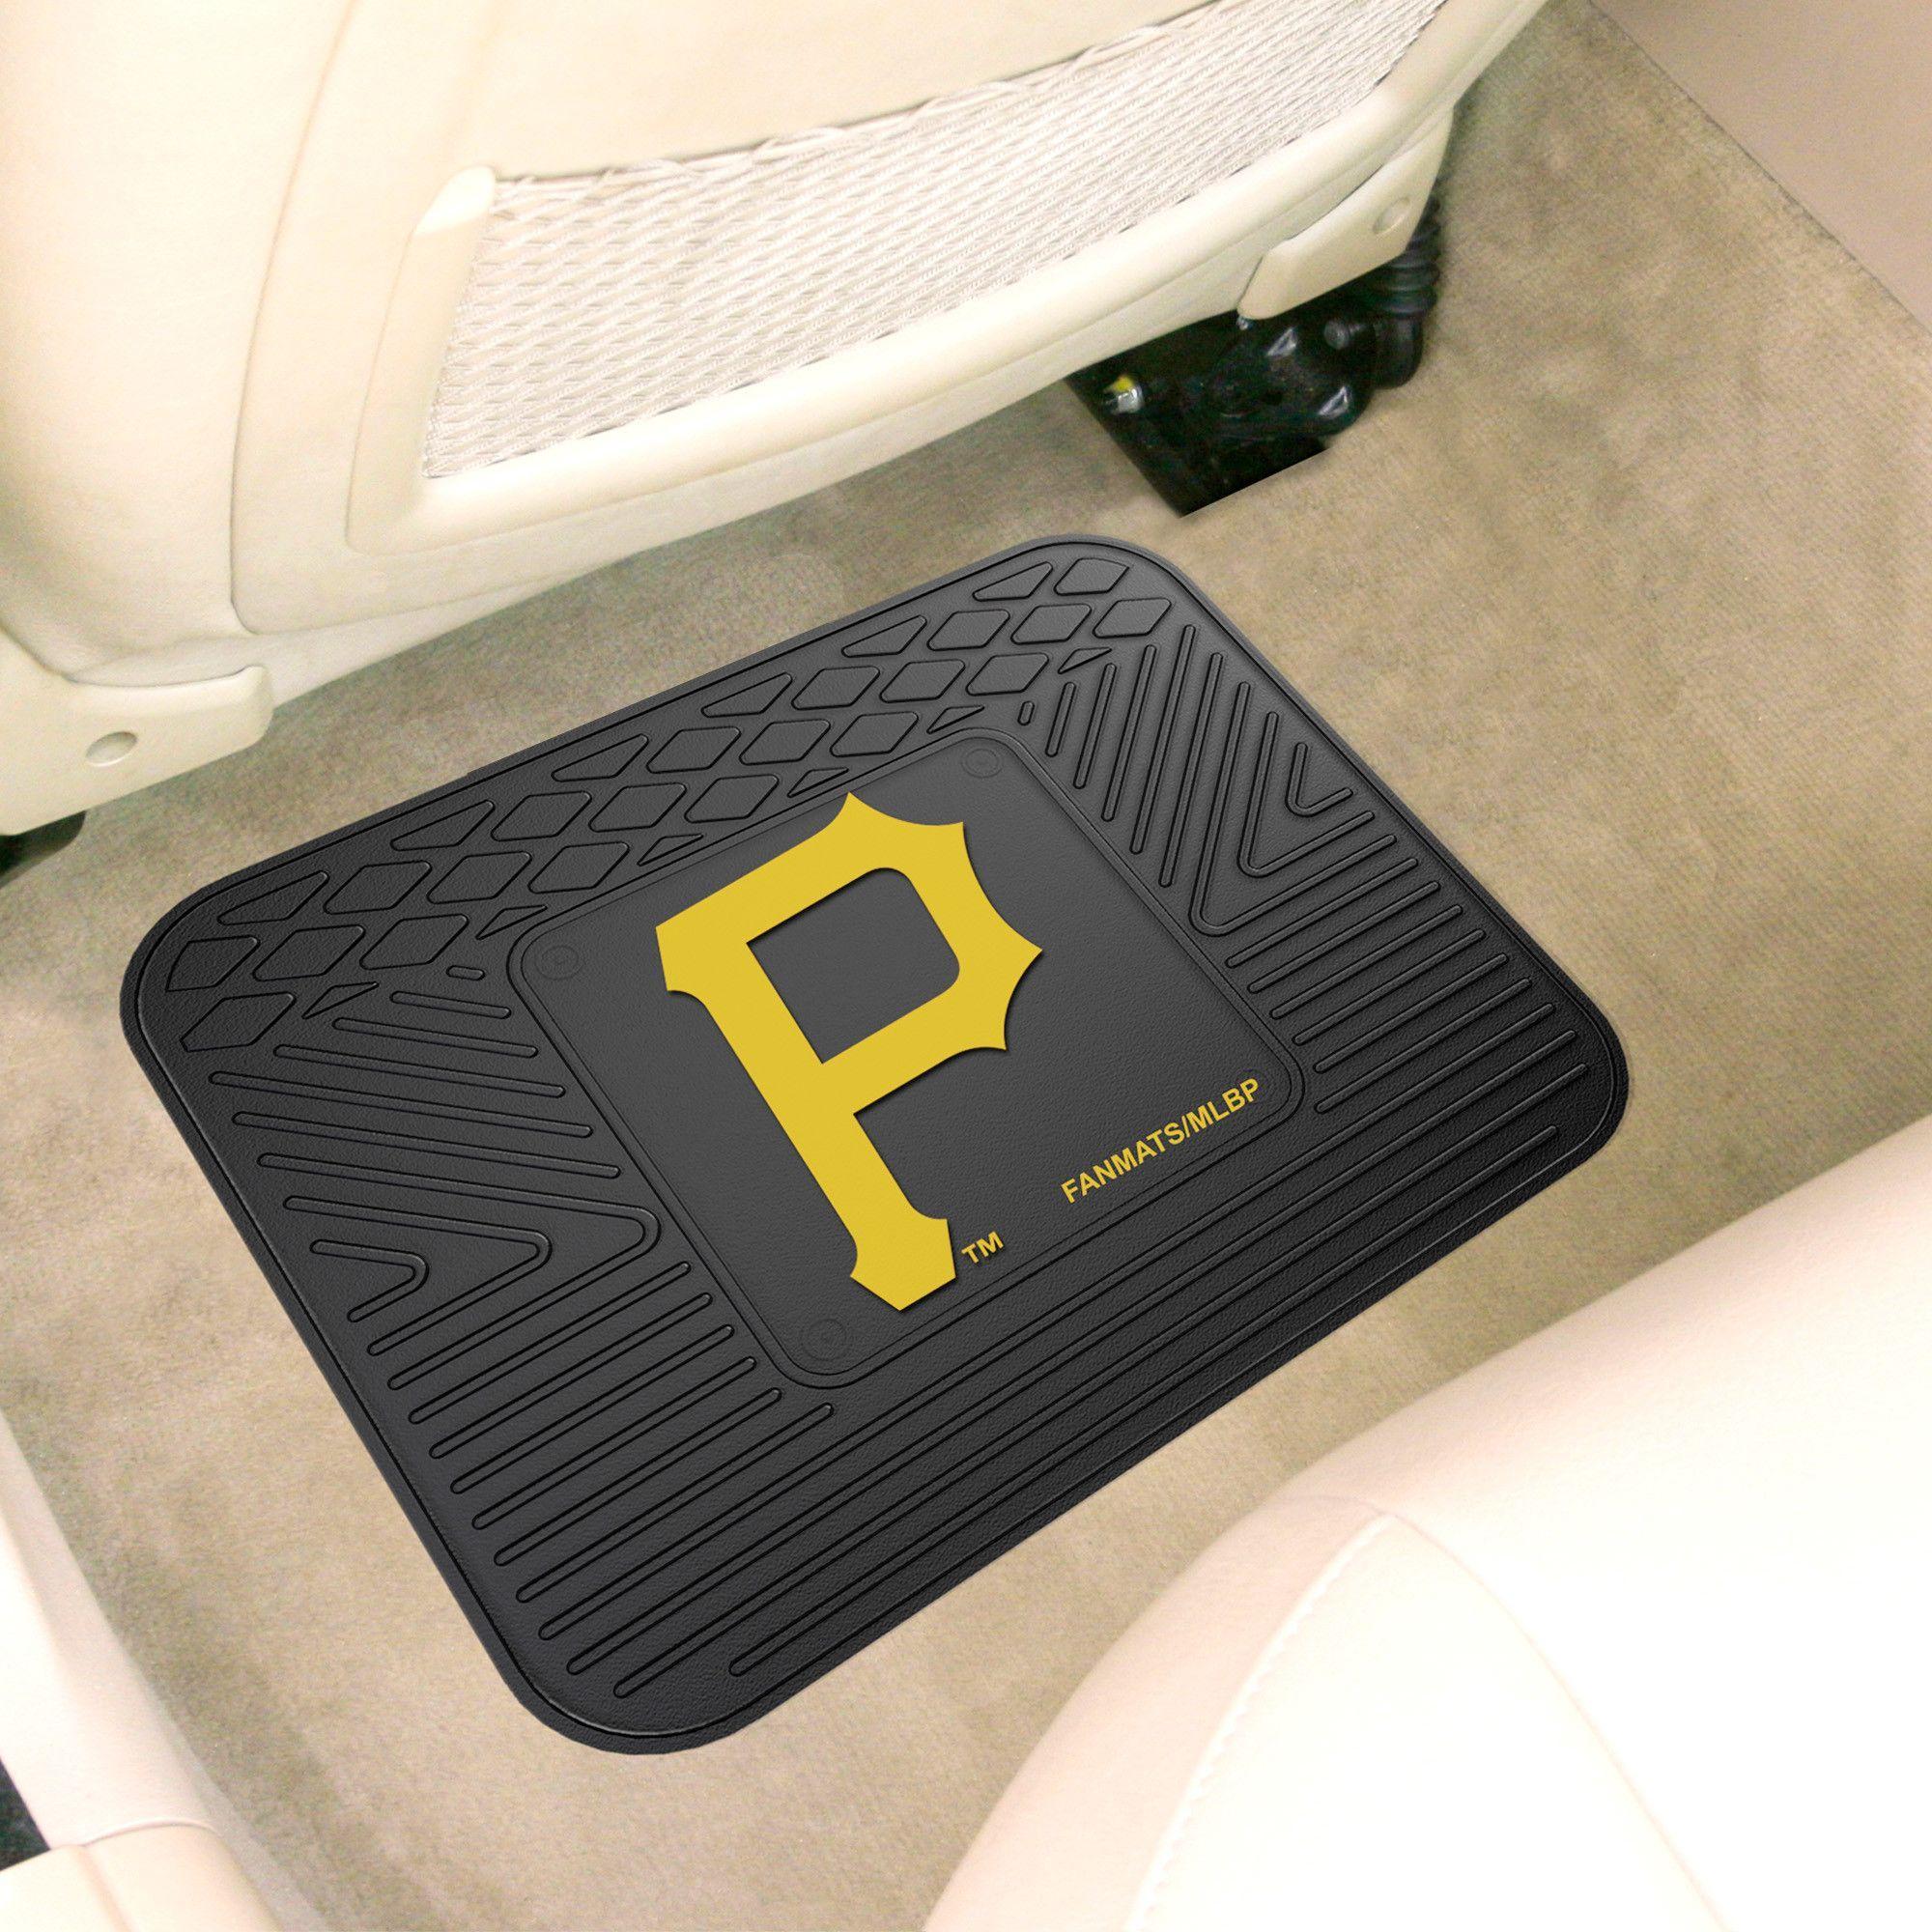 toyota floor wrangler maxpider stowable product jeep mats maxpiderbacking gray kagu prius liner cargo